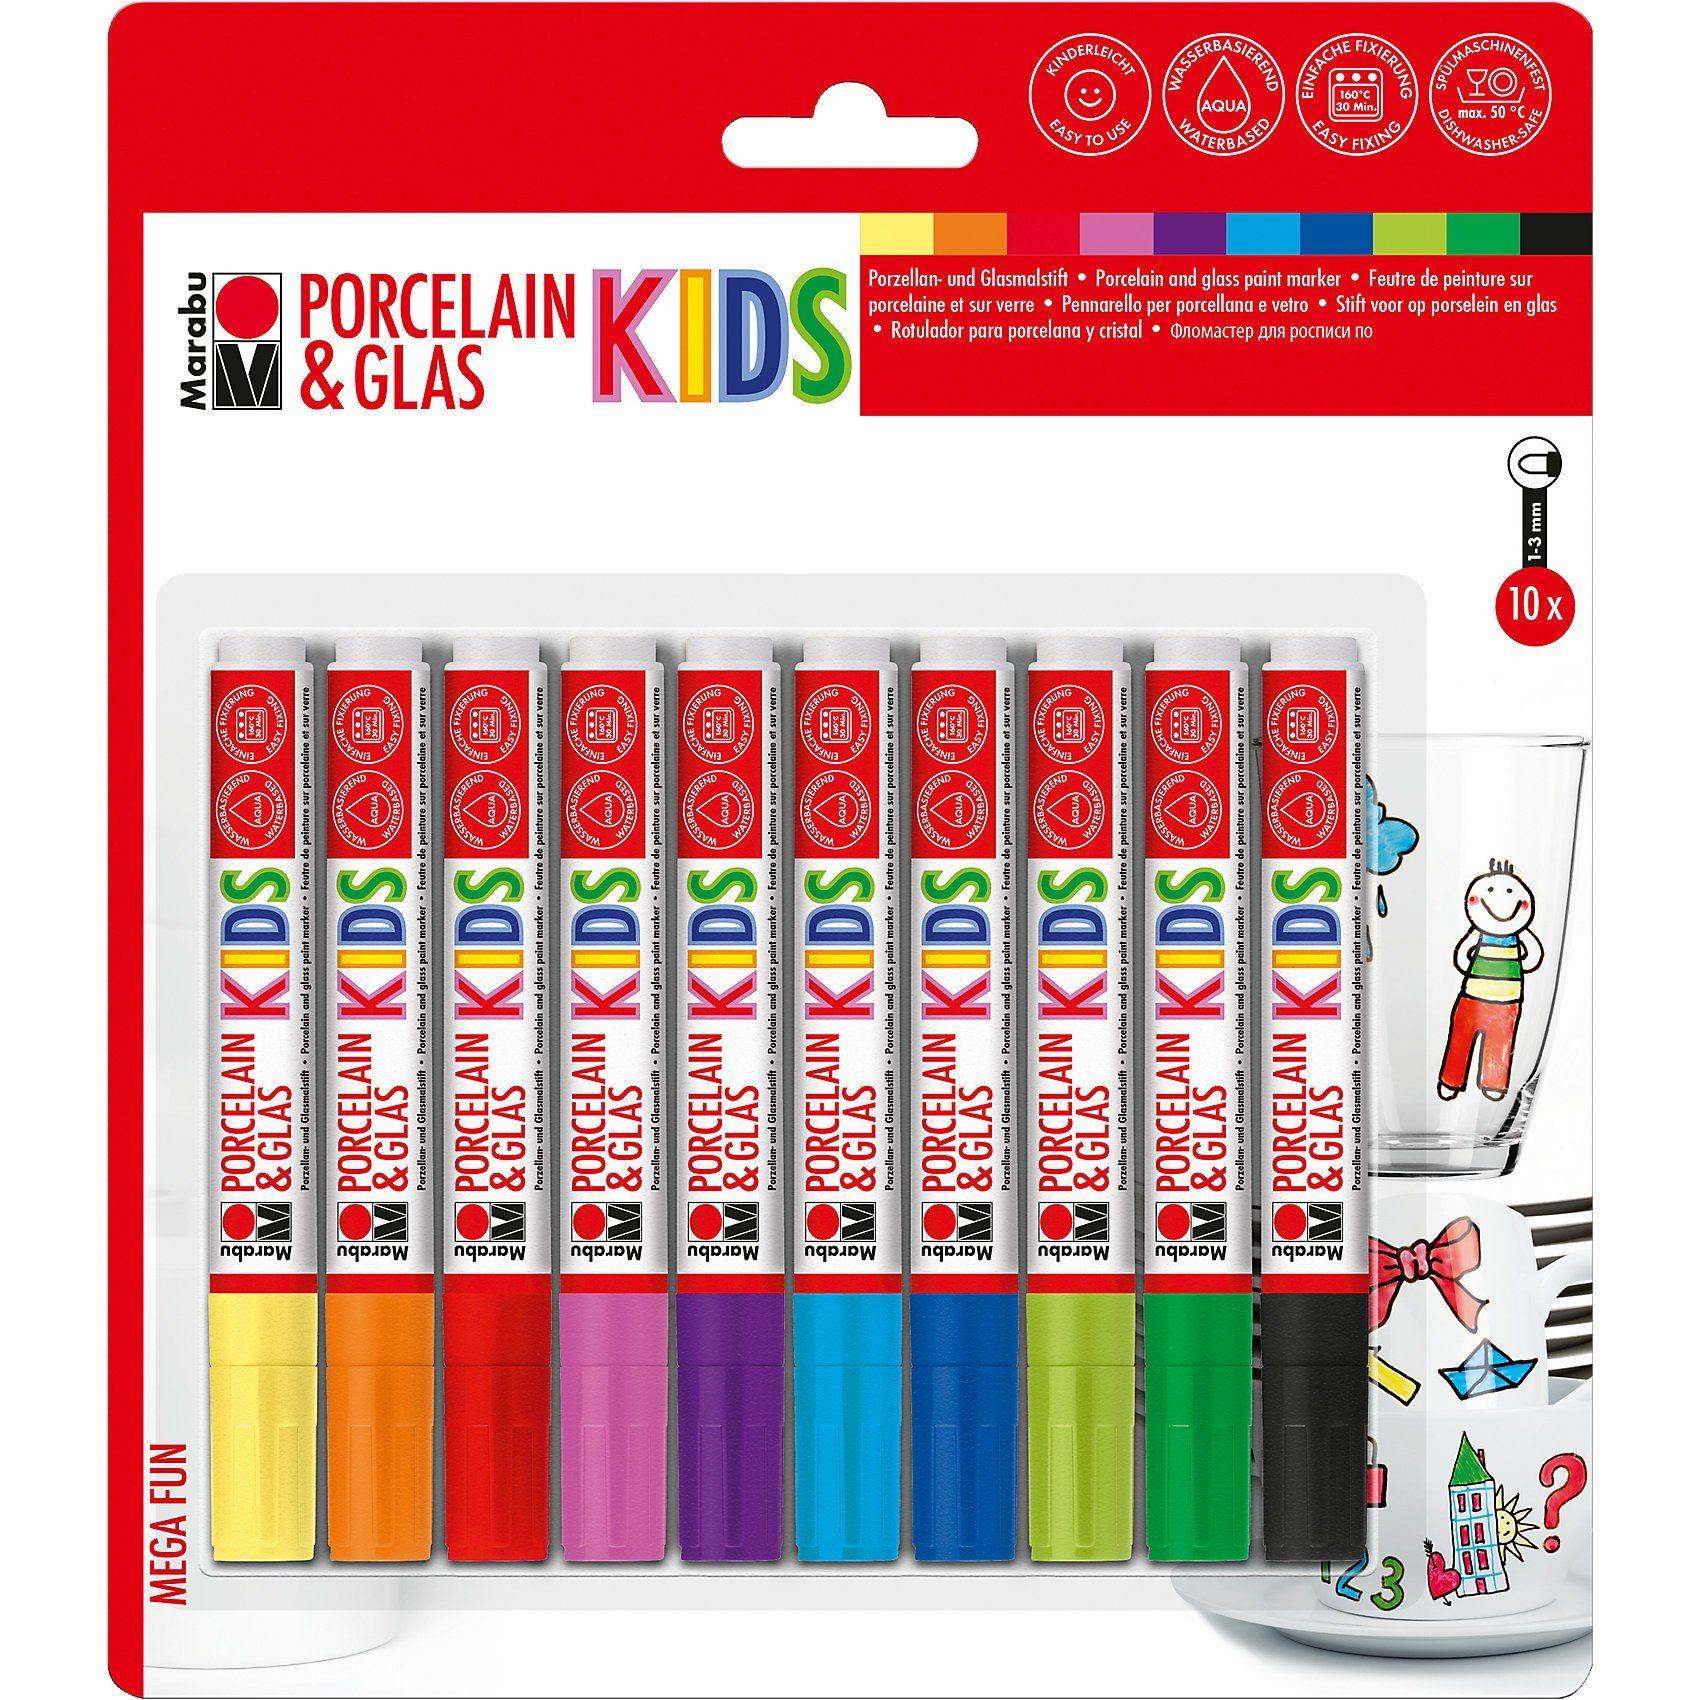 Marabu Porzellan- & Glasmalstifte Kids Mega Fun, 10 Stück